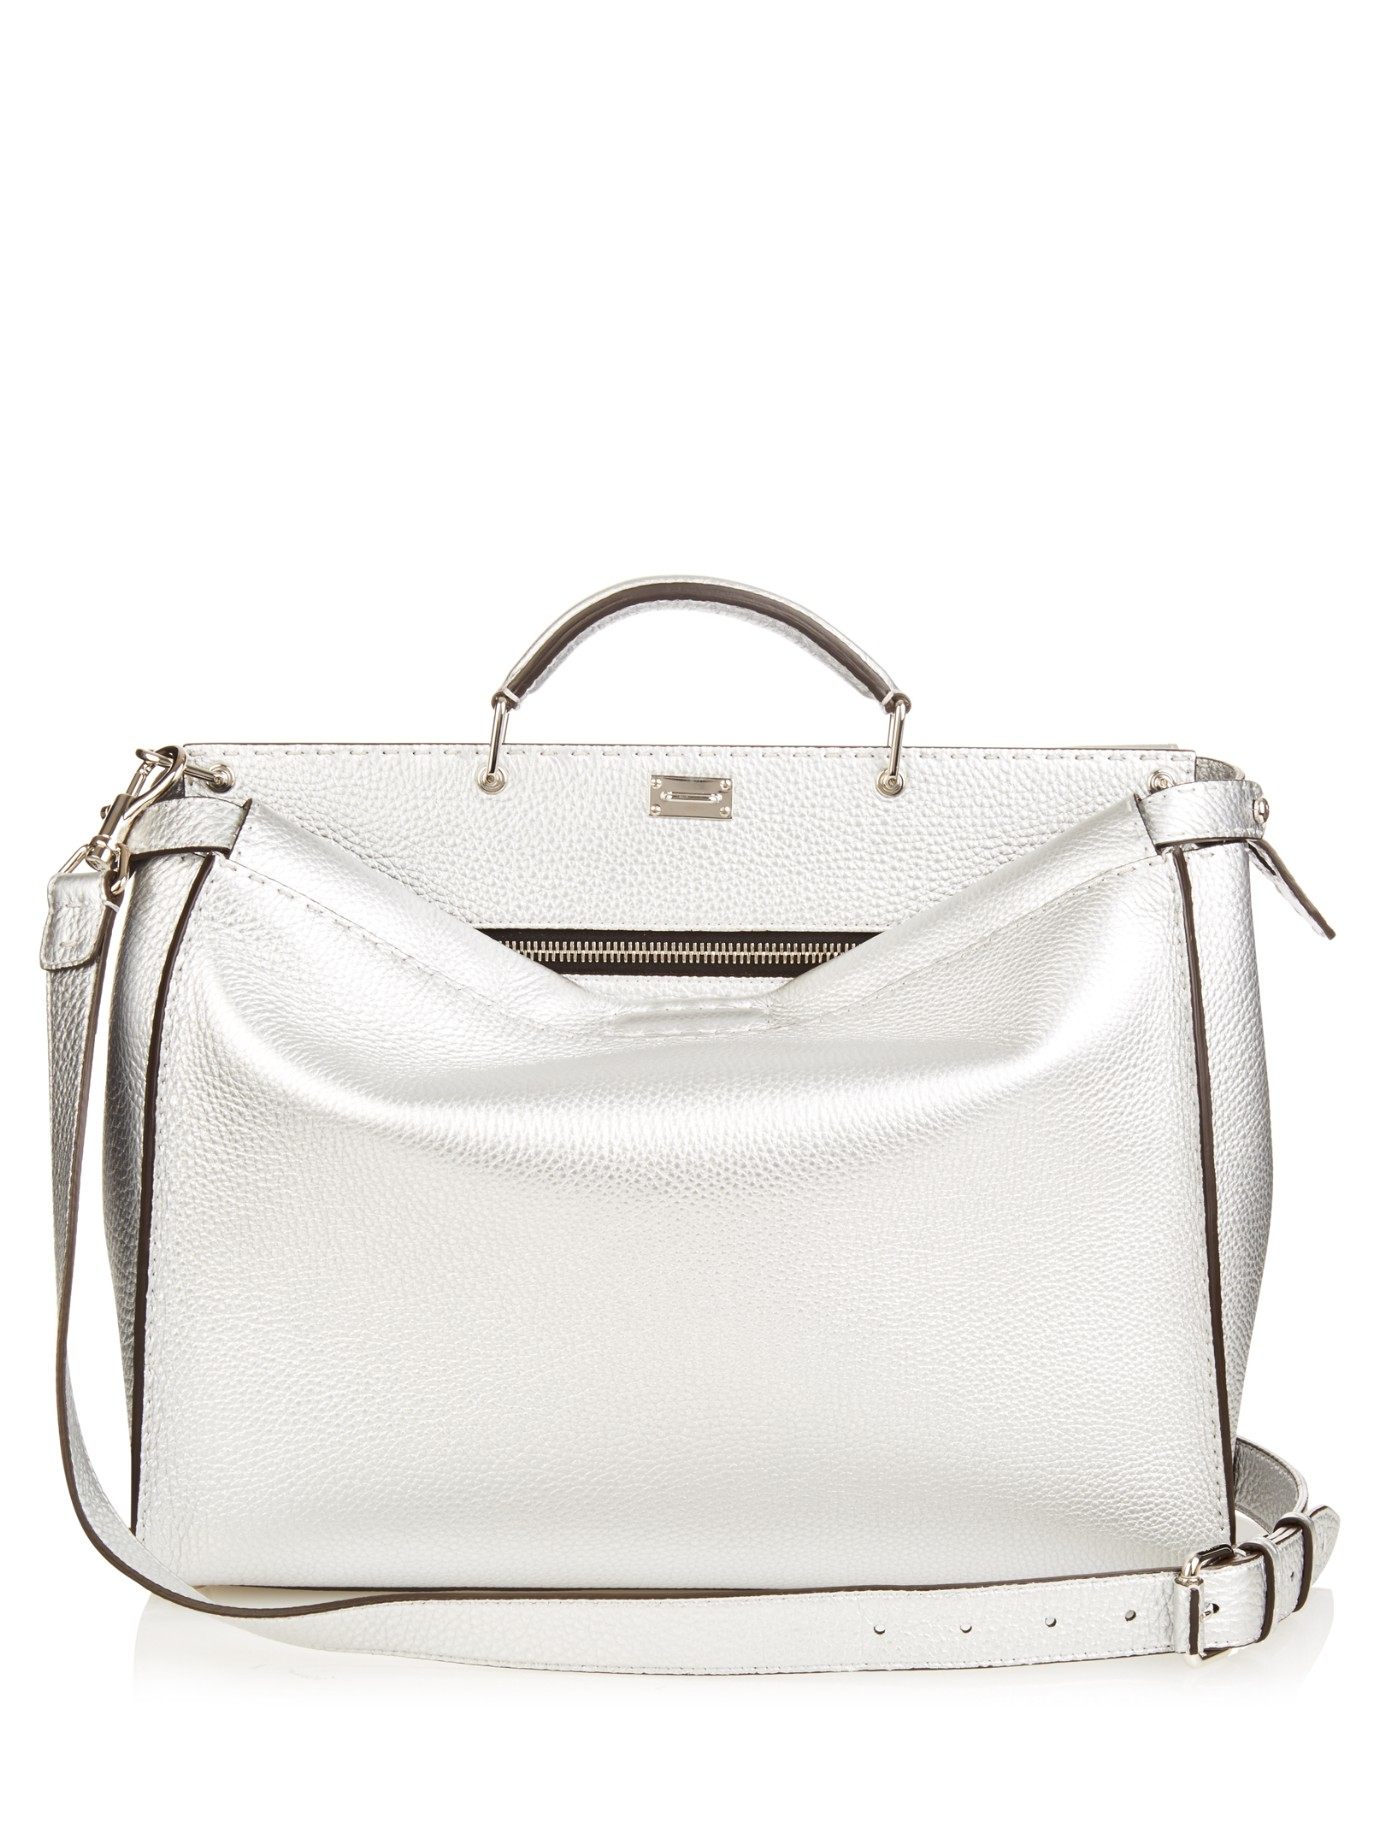 616114467a1 Lyst - Fendi Selleria Peekaboo Leather Weekend Bag in Metallic for Men